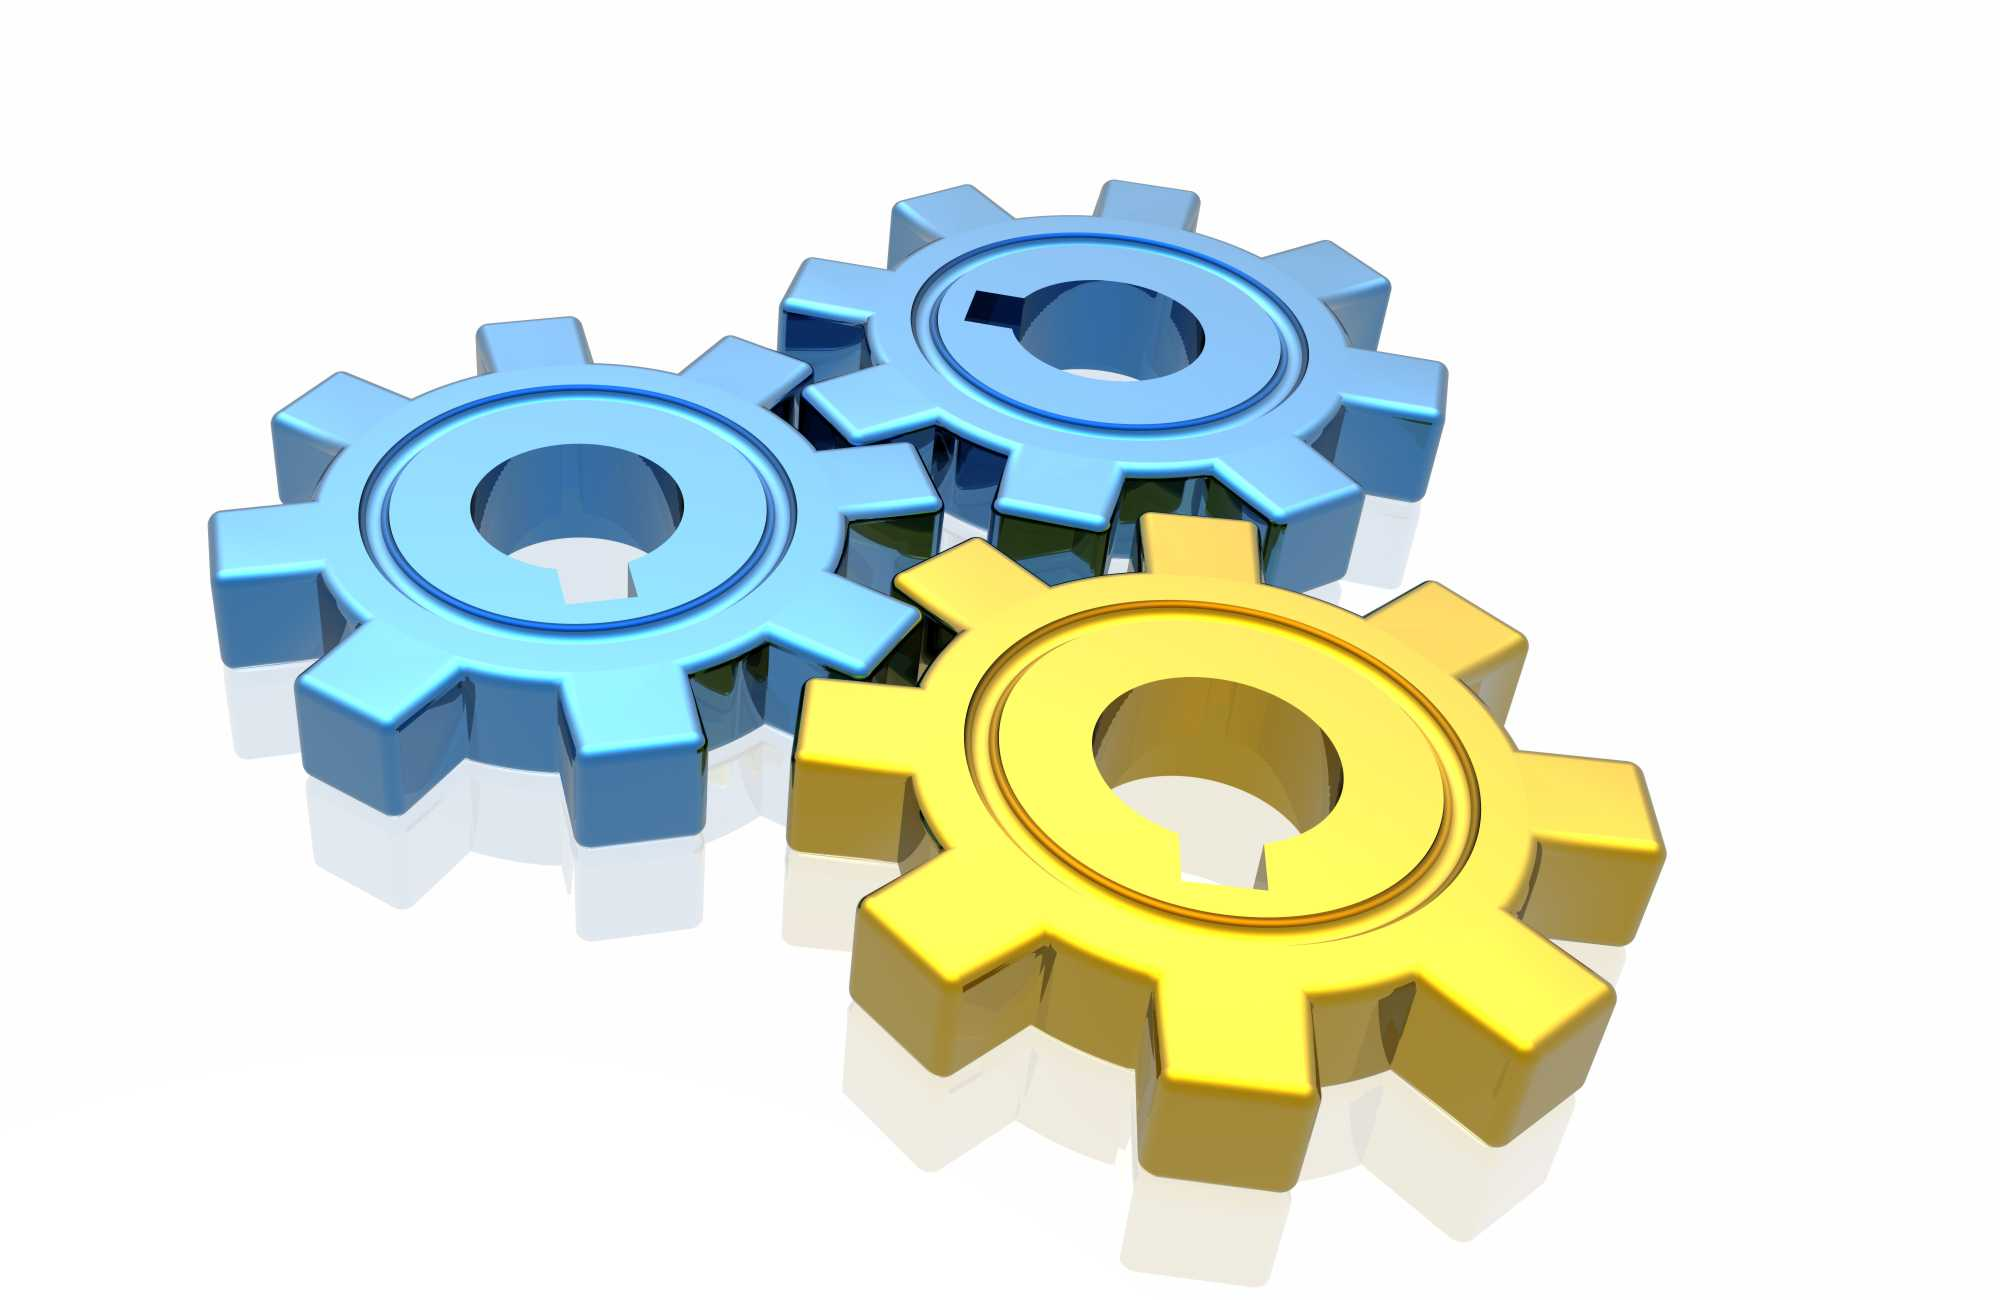 13-1300-1800-number-setup-routing-diversion-options-hero-240418